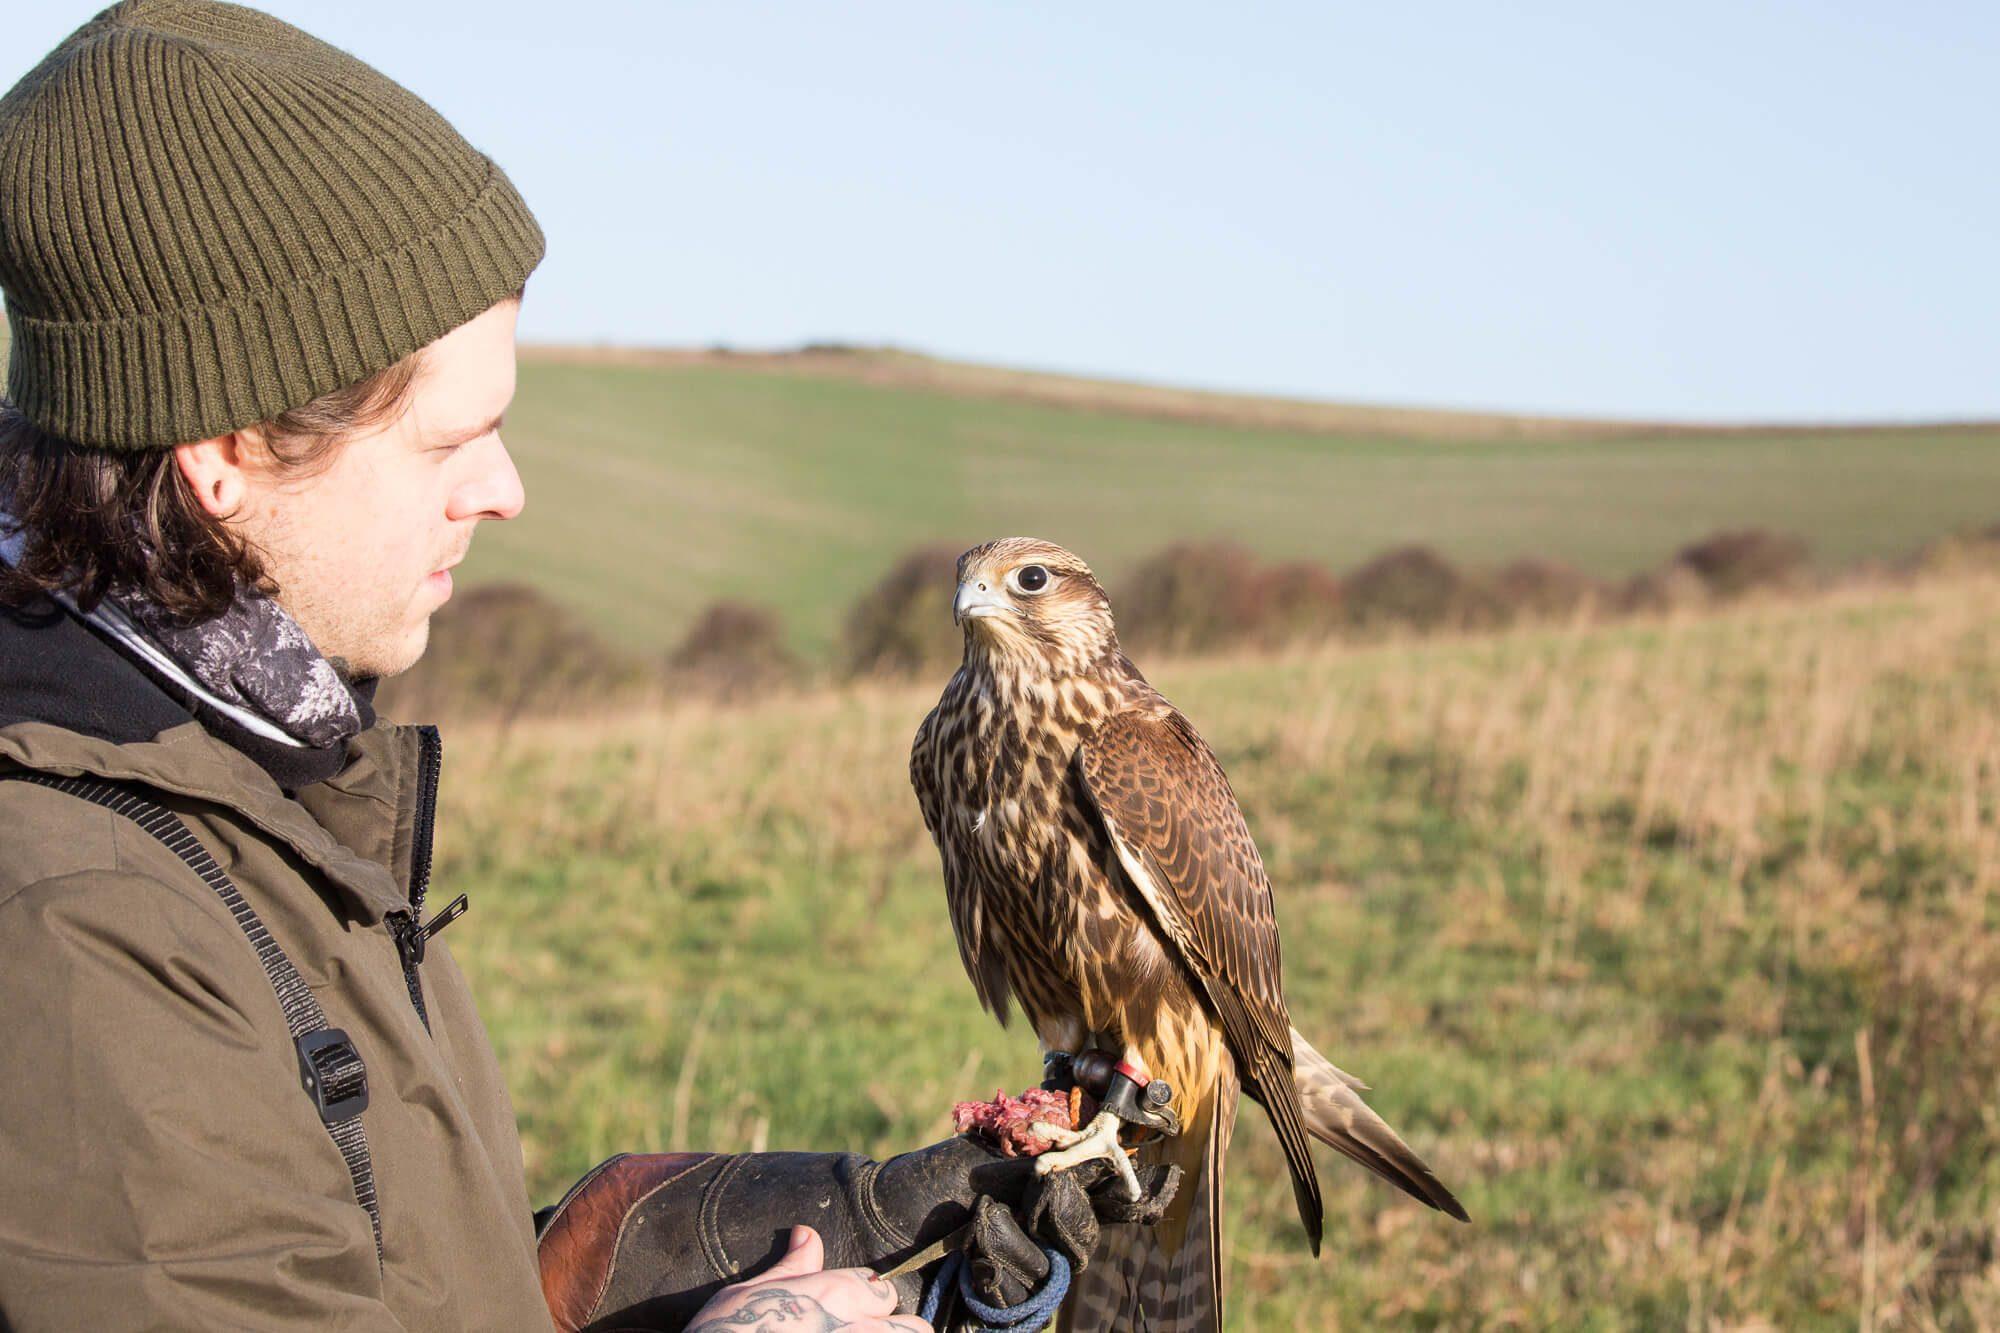 Eliot Holding a Falcon